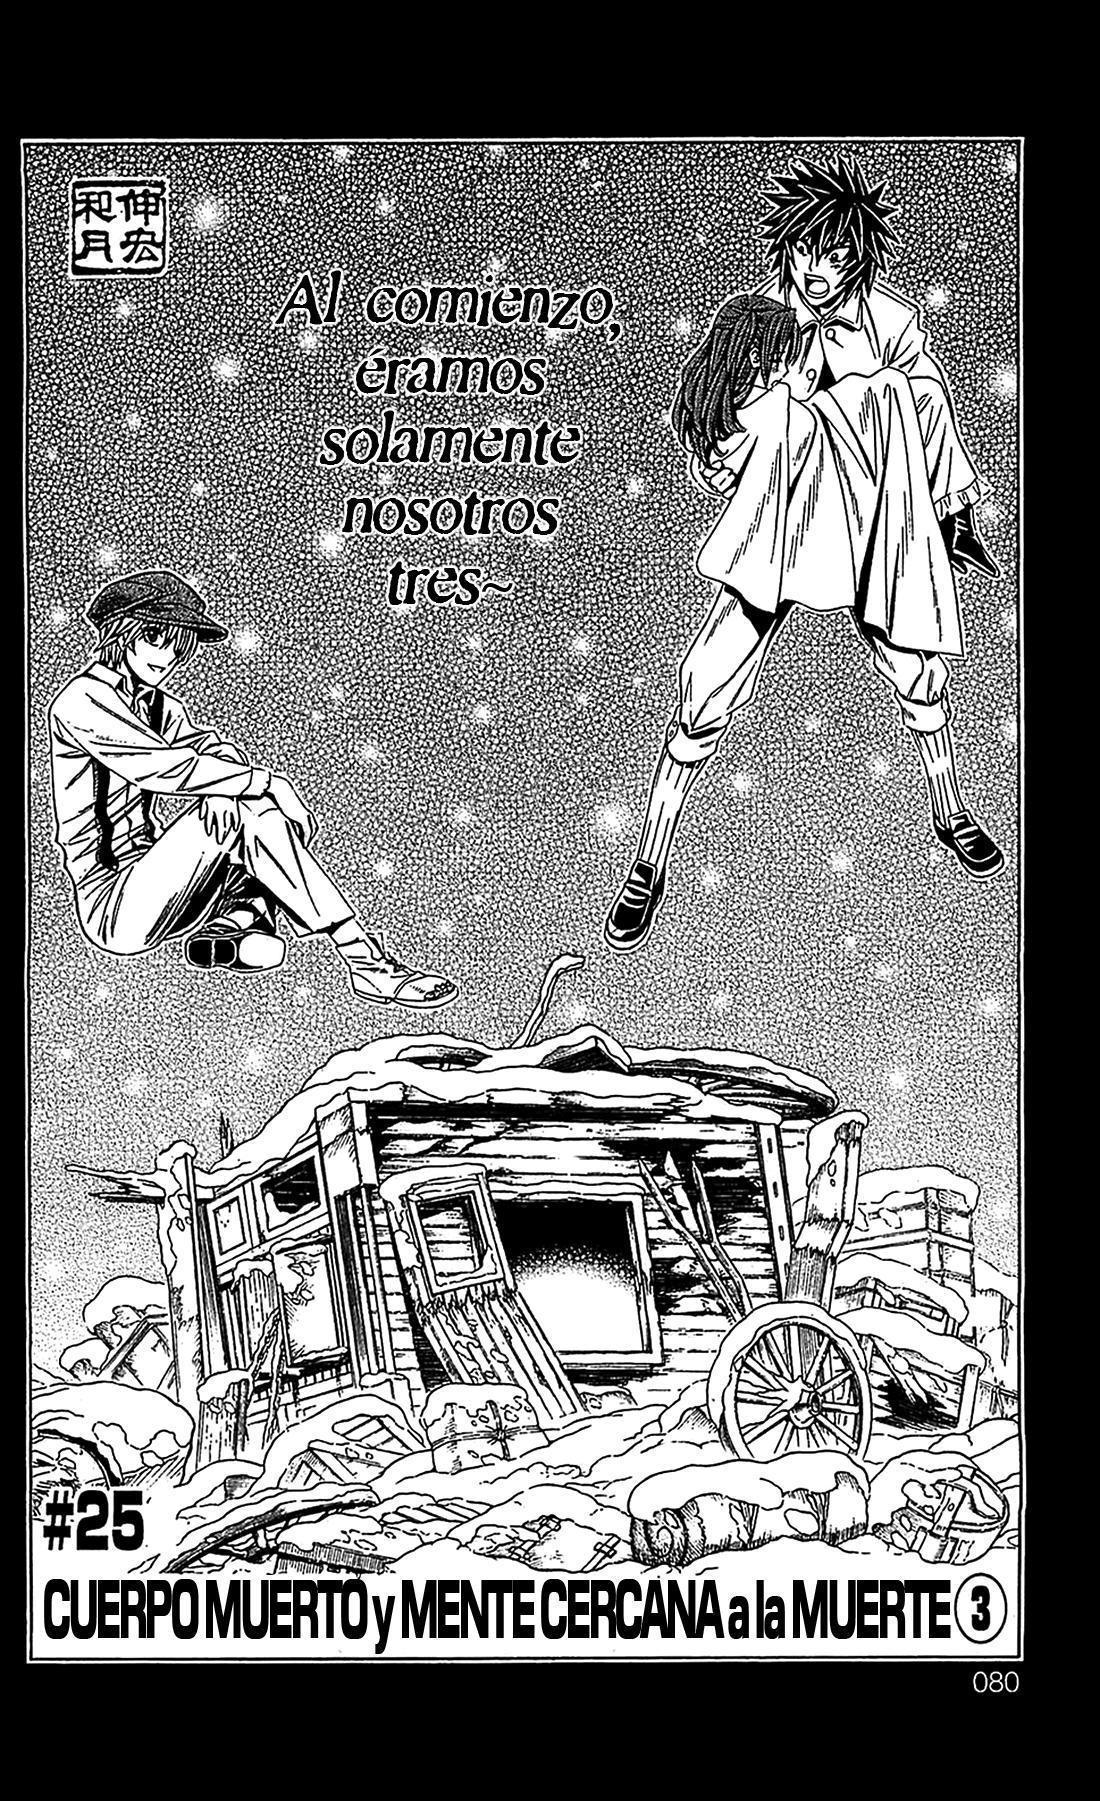 http://c5.ninemanga.com/es_manga/45/18797/447916/d9798cdf31c02d86b8b81cc119d94836.jpg Page 4